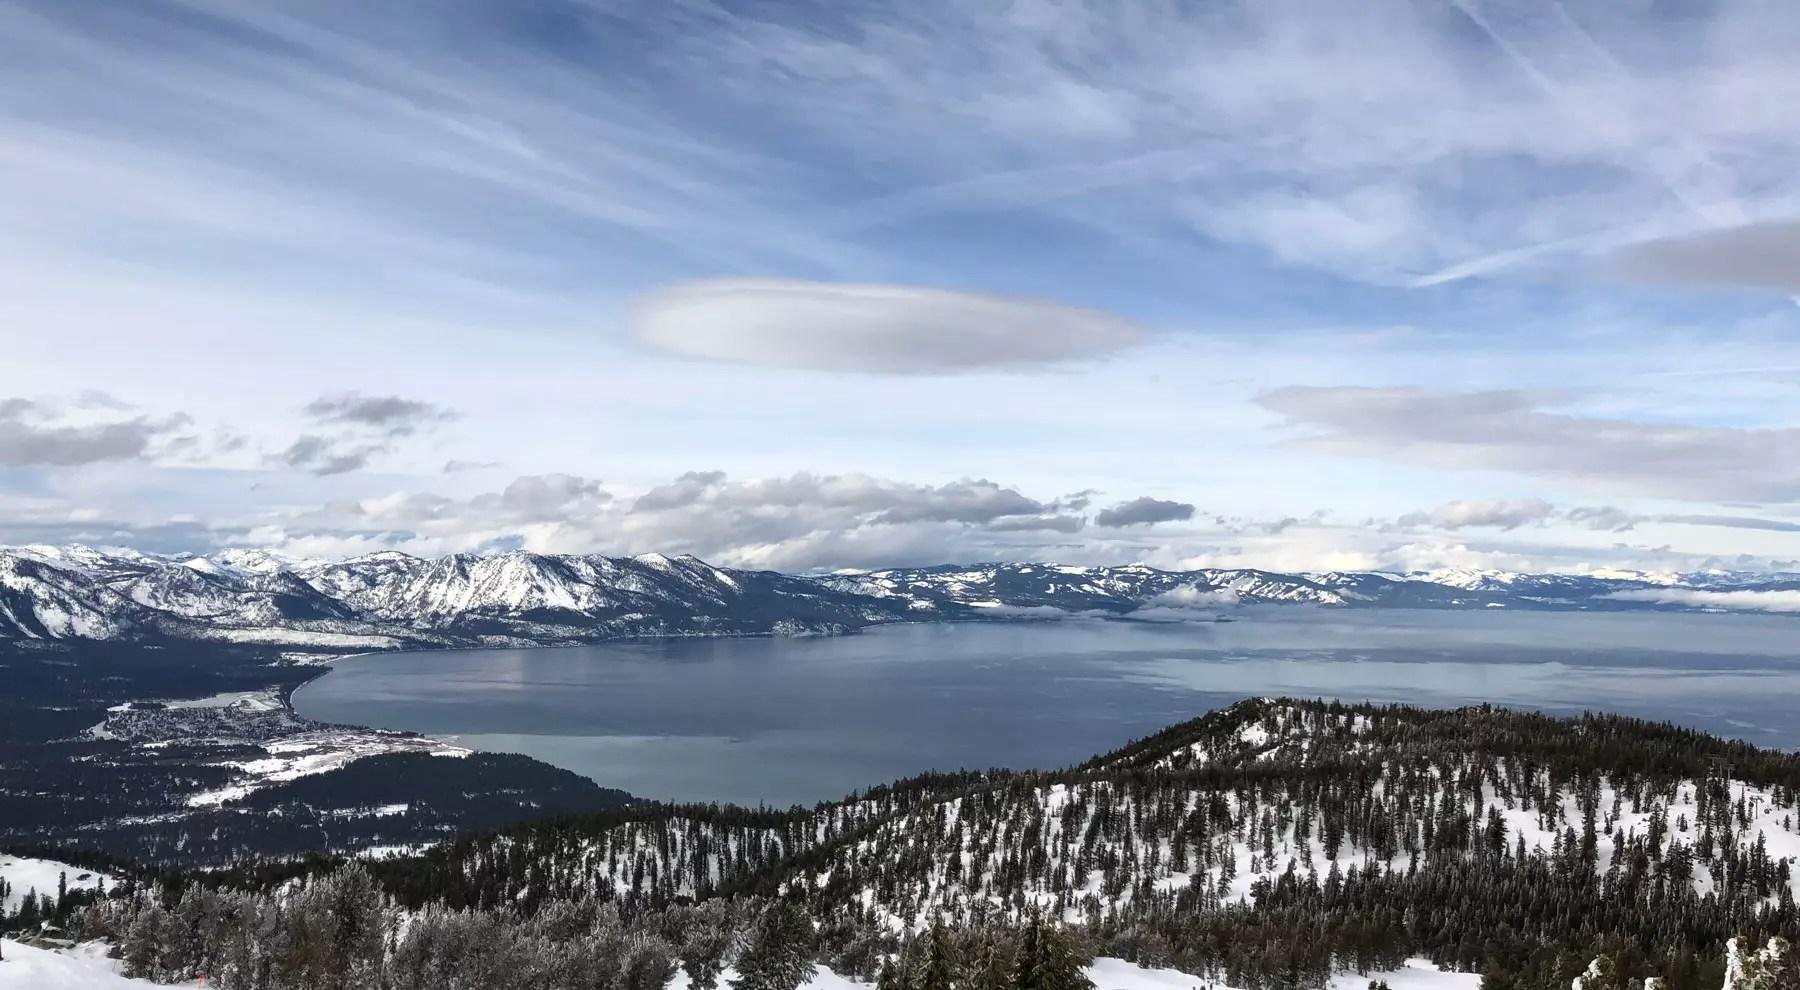 esqui em Heavenly Lake Tahoe California